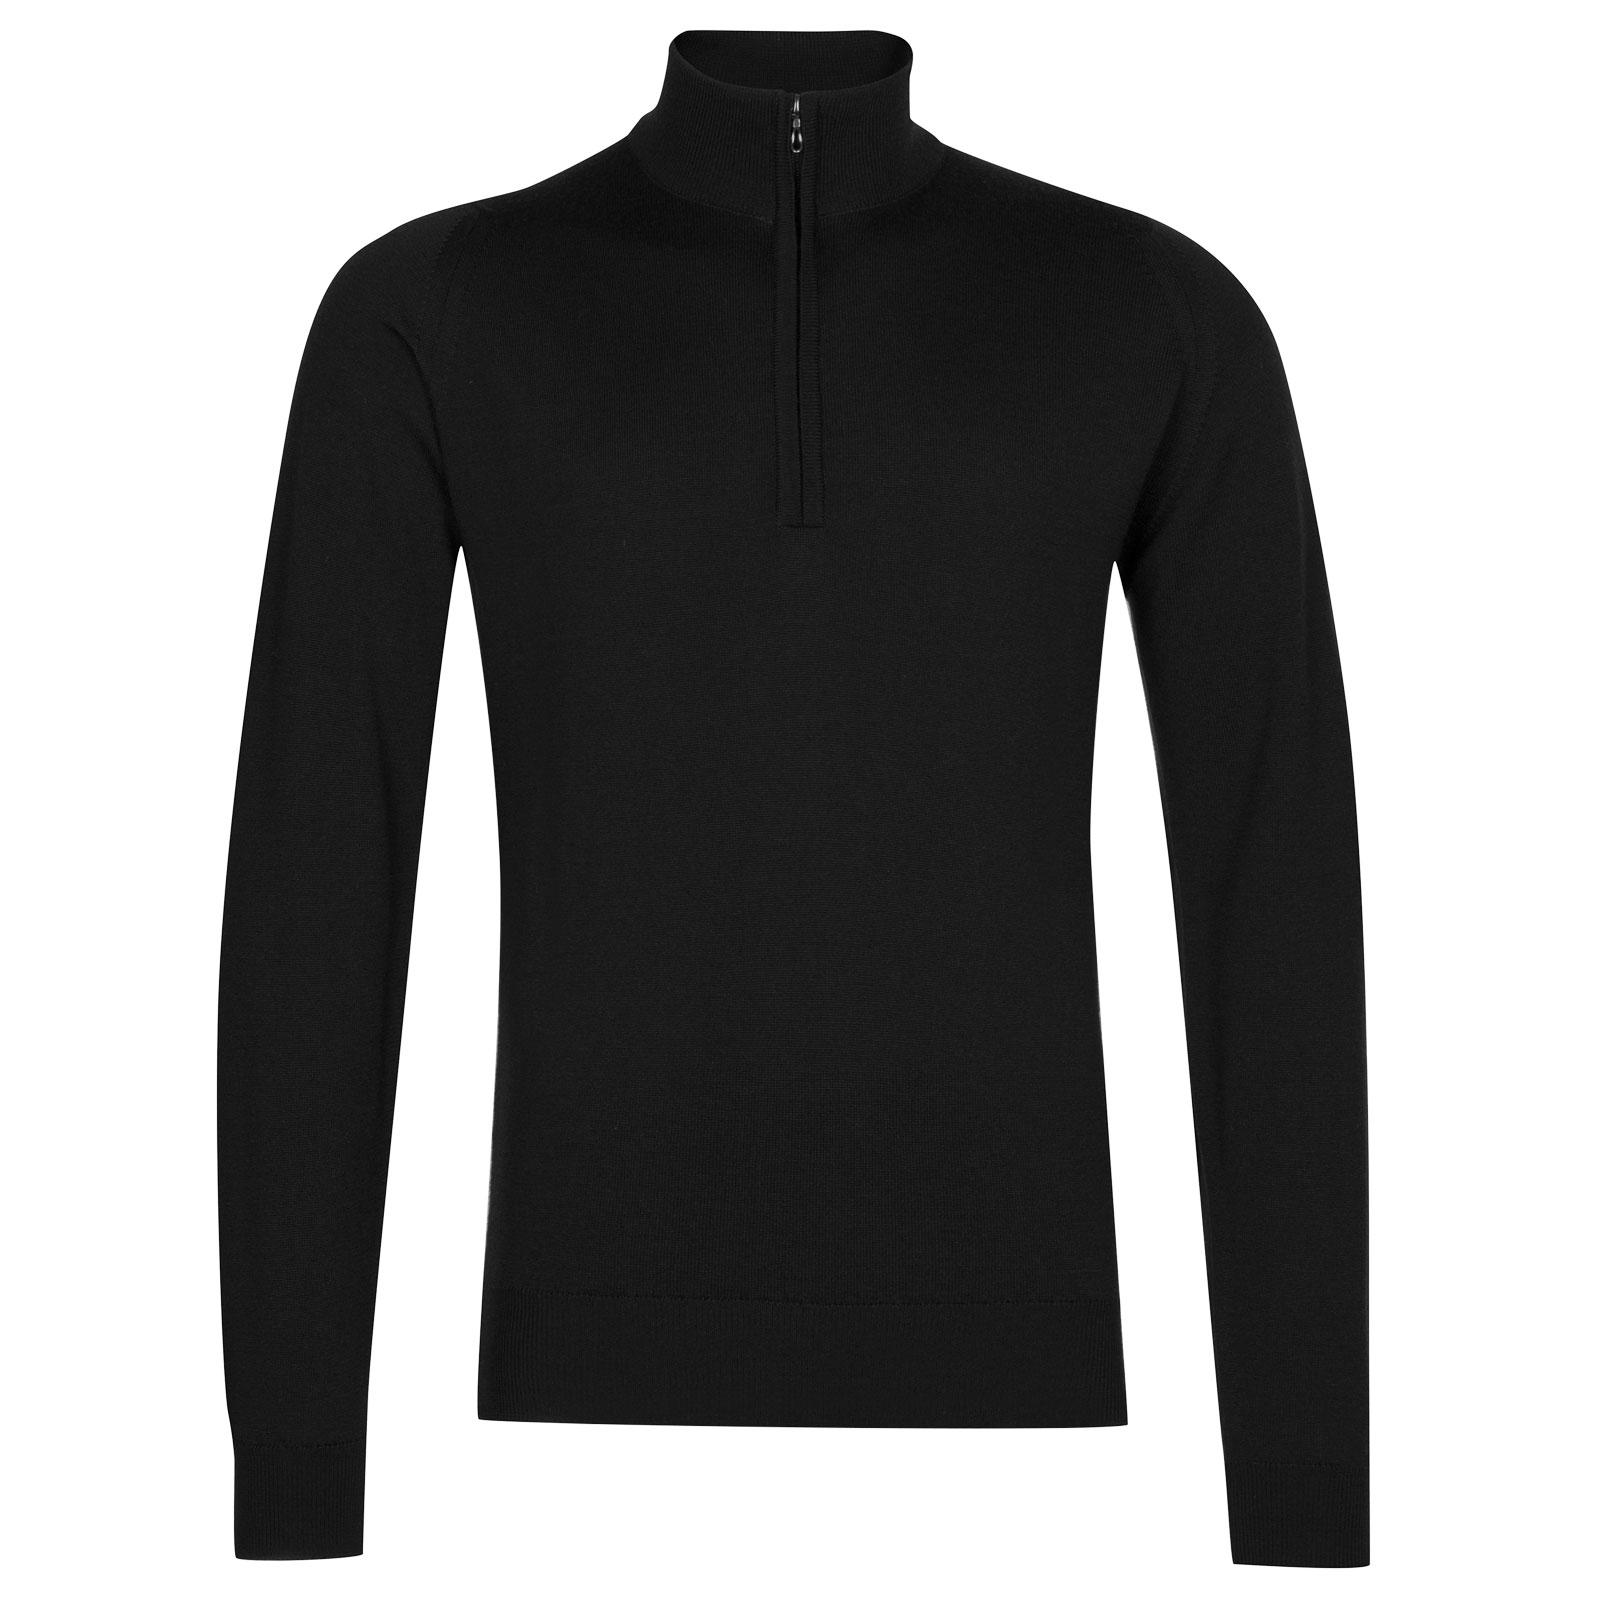 John Smedley tapton Merino Wool Pullover in Black-S